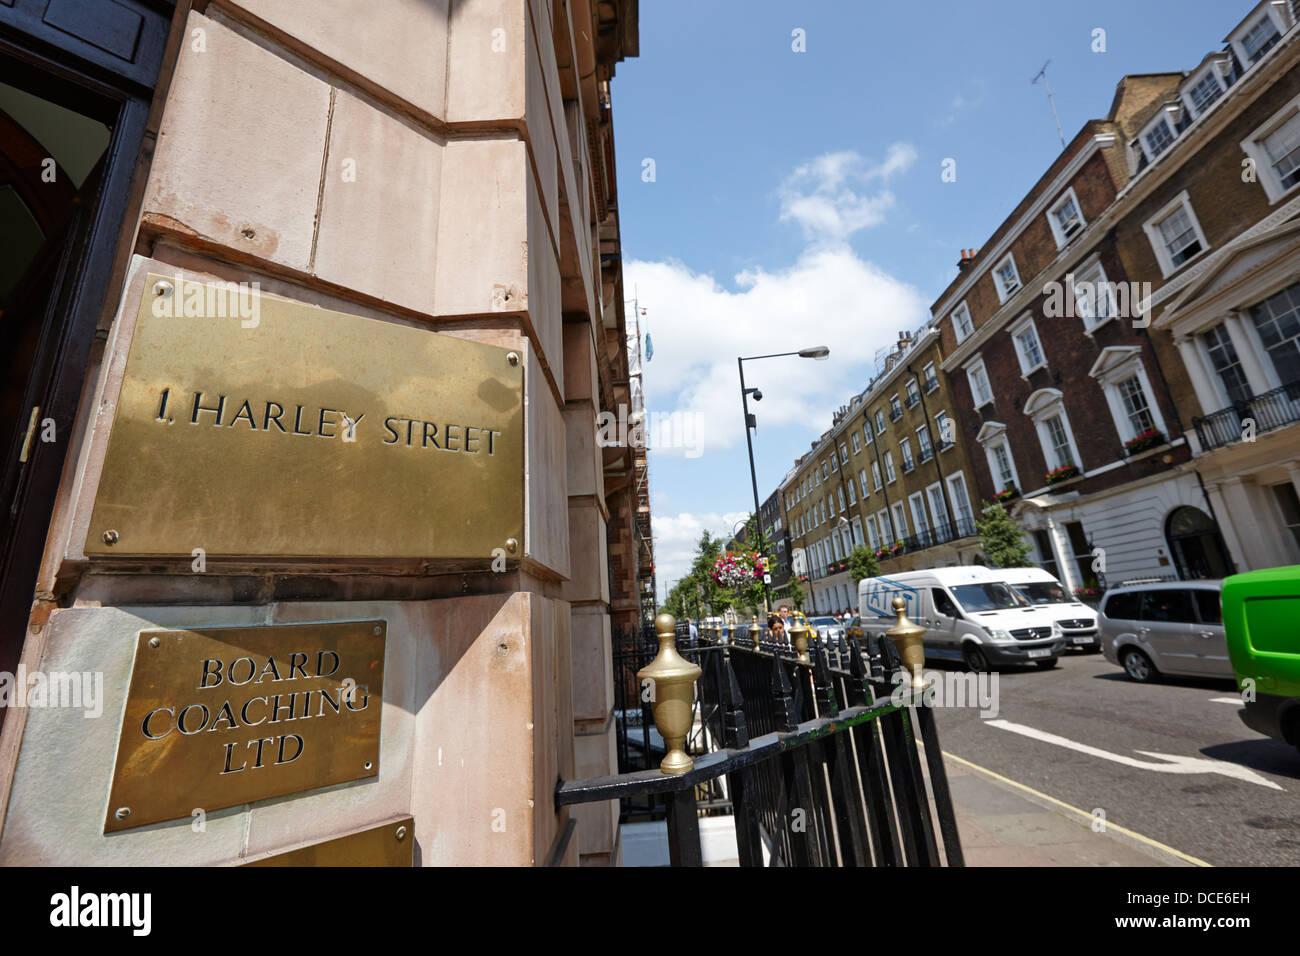 Harley Street London England UK Photo Stock